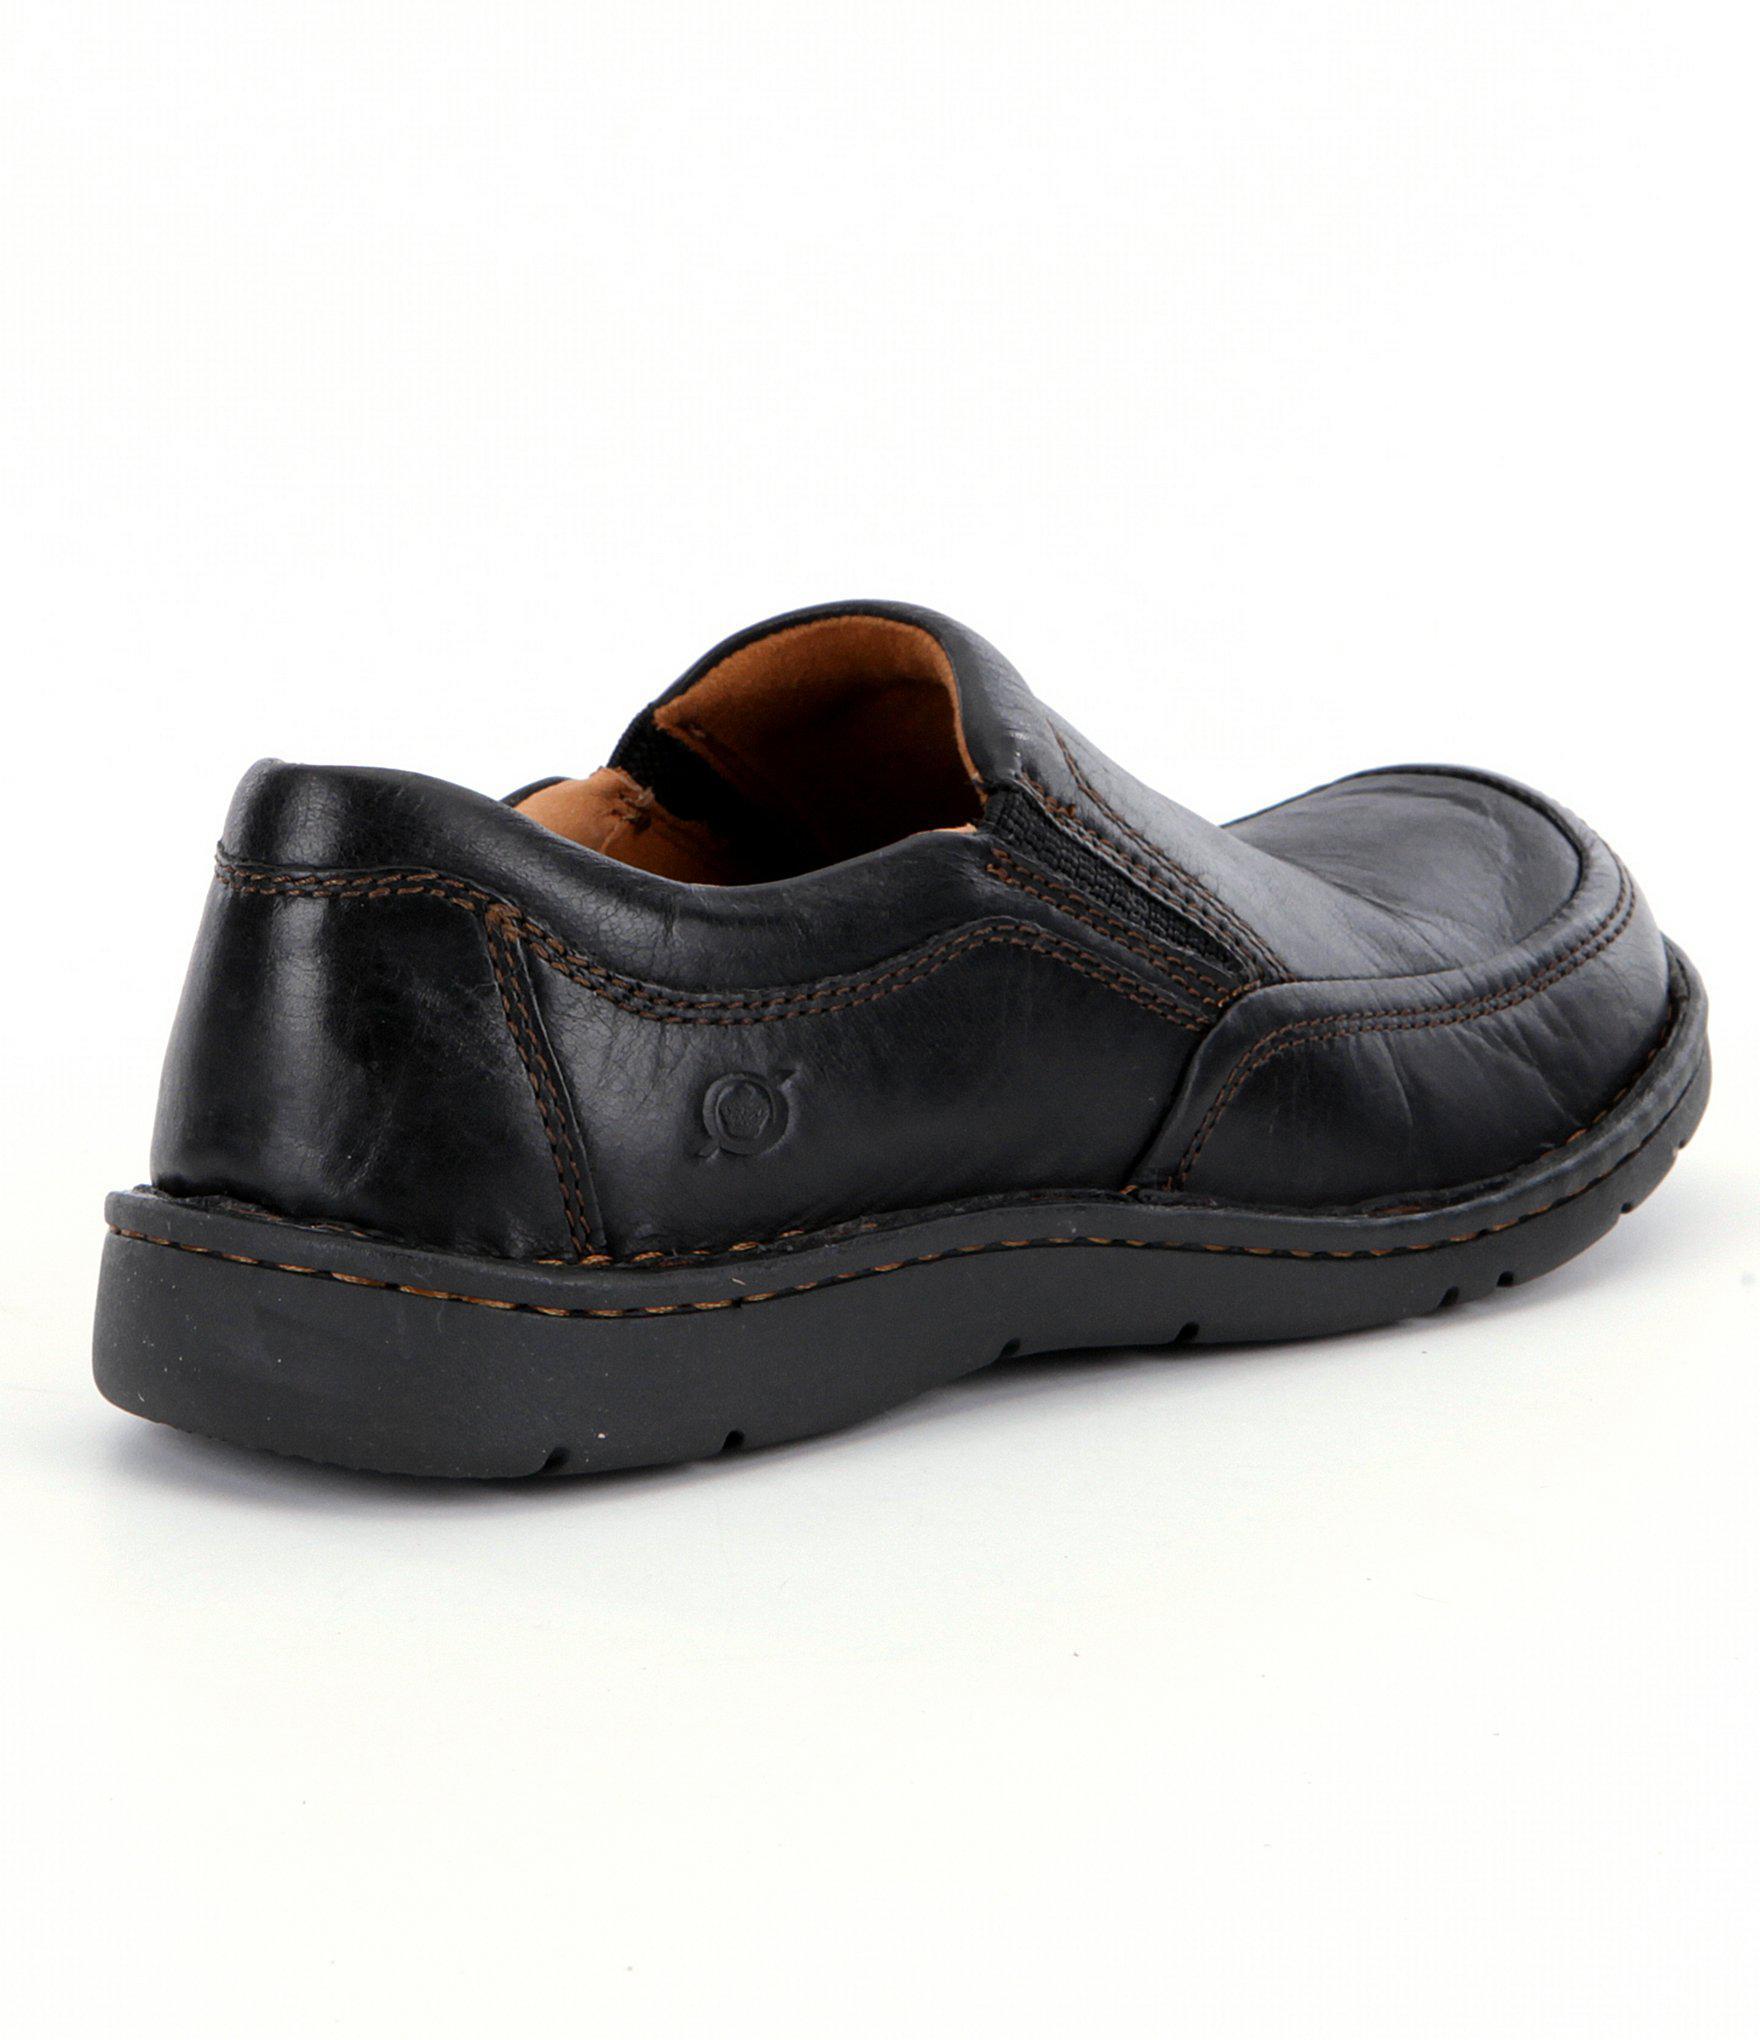 bb74461950ee11 Born black luis shoes for men view fullscreen jpg 1760x2040 Black men born  shoes